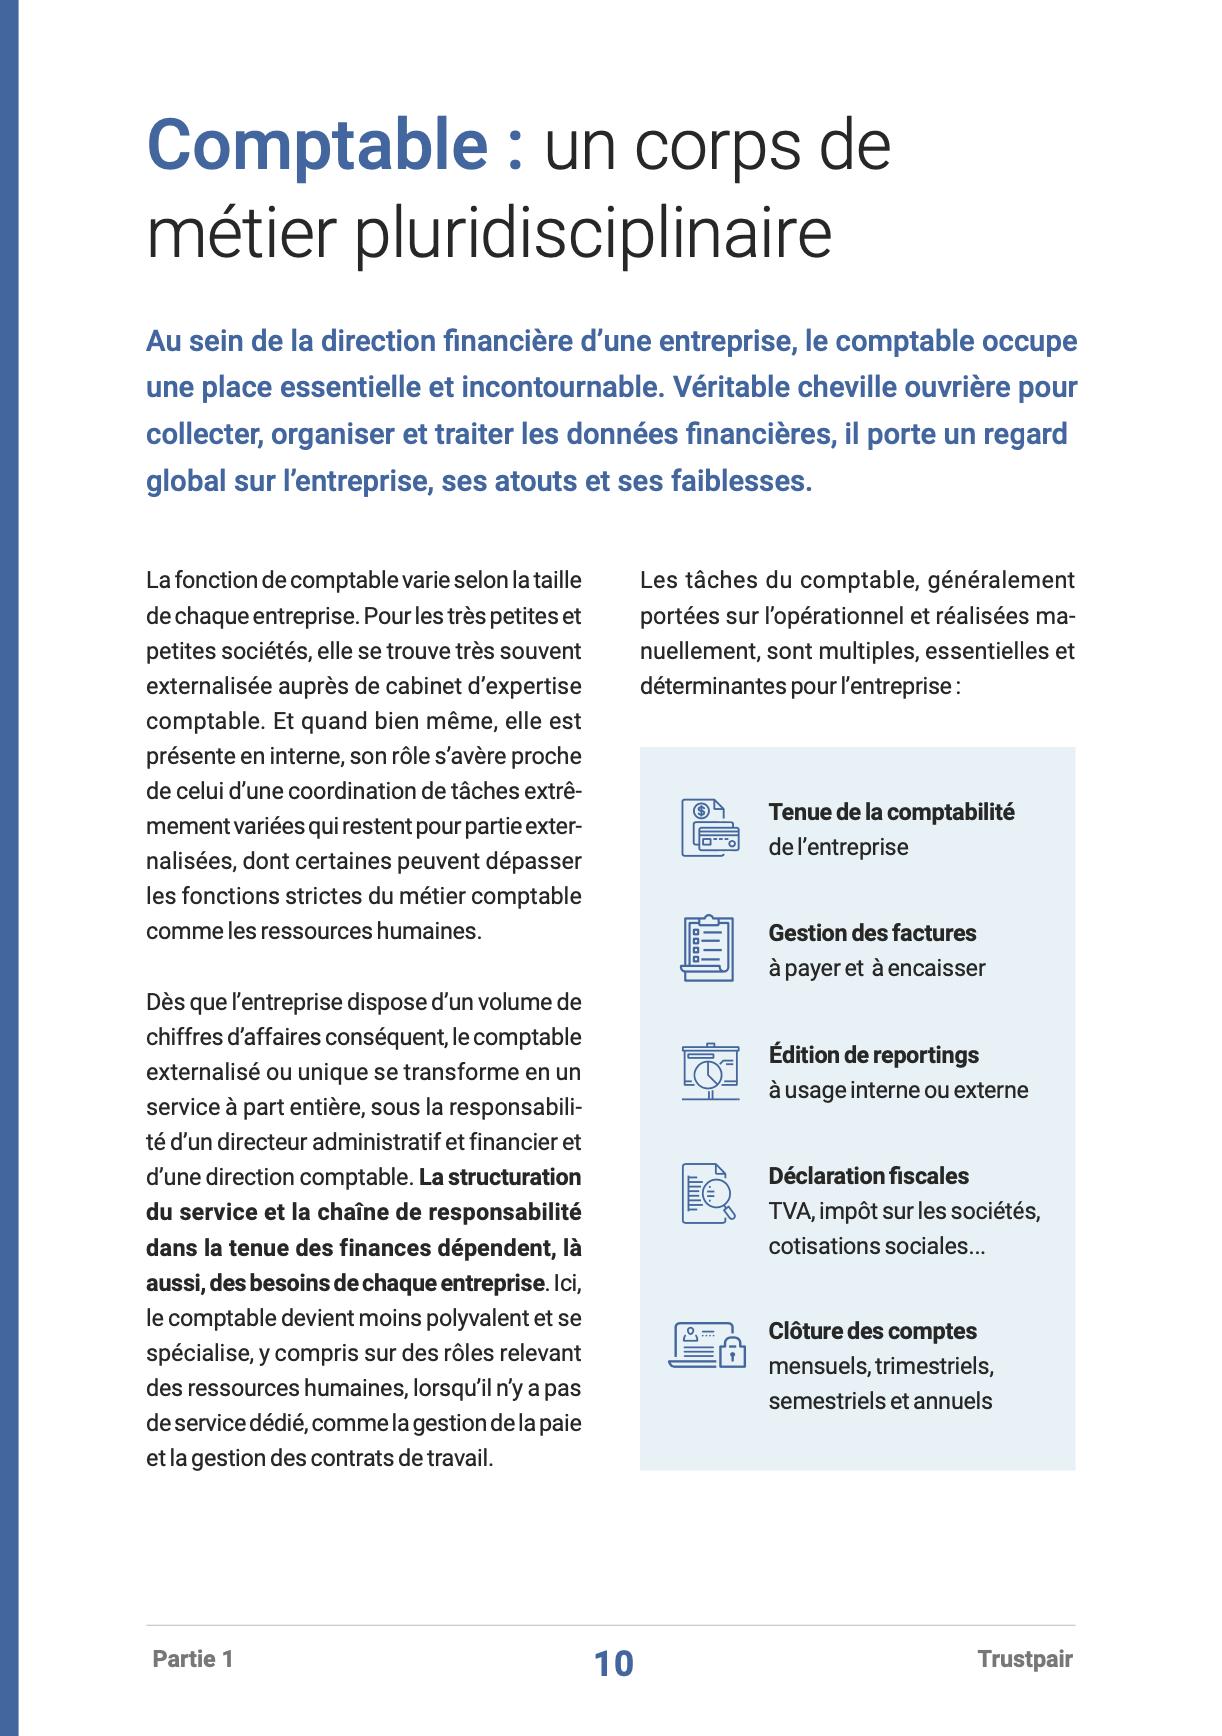 comptabilite_metier_pluridisciplinaire